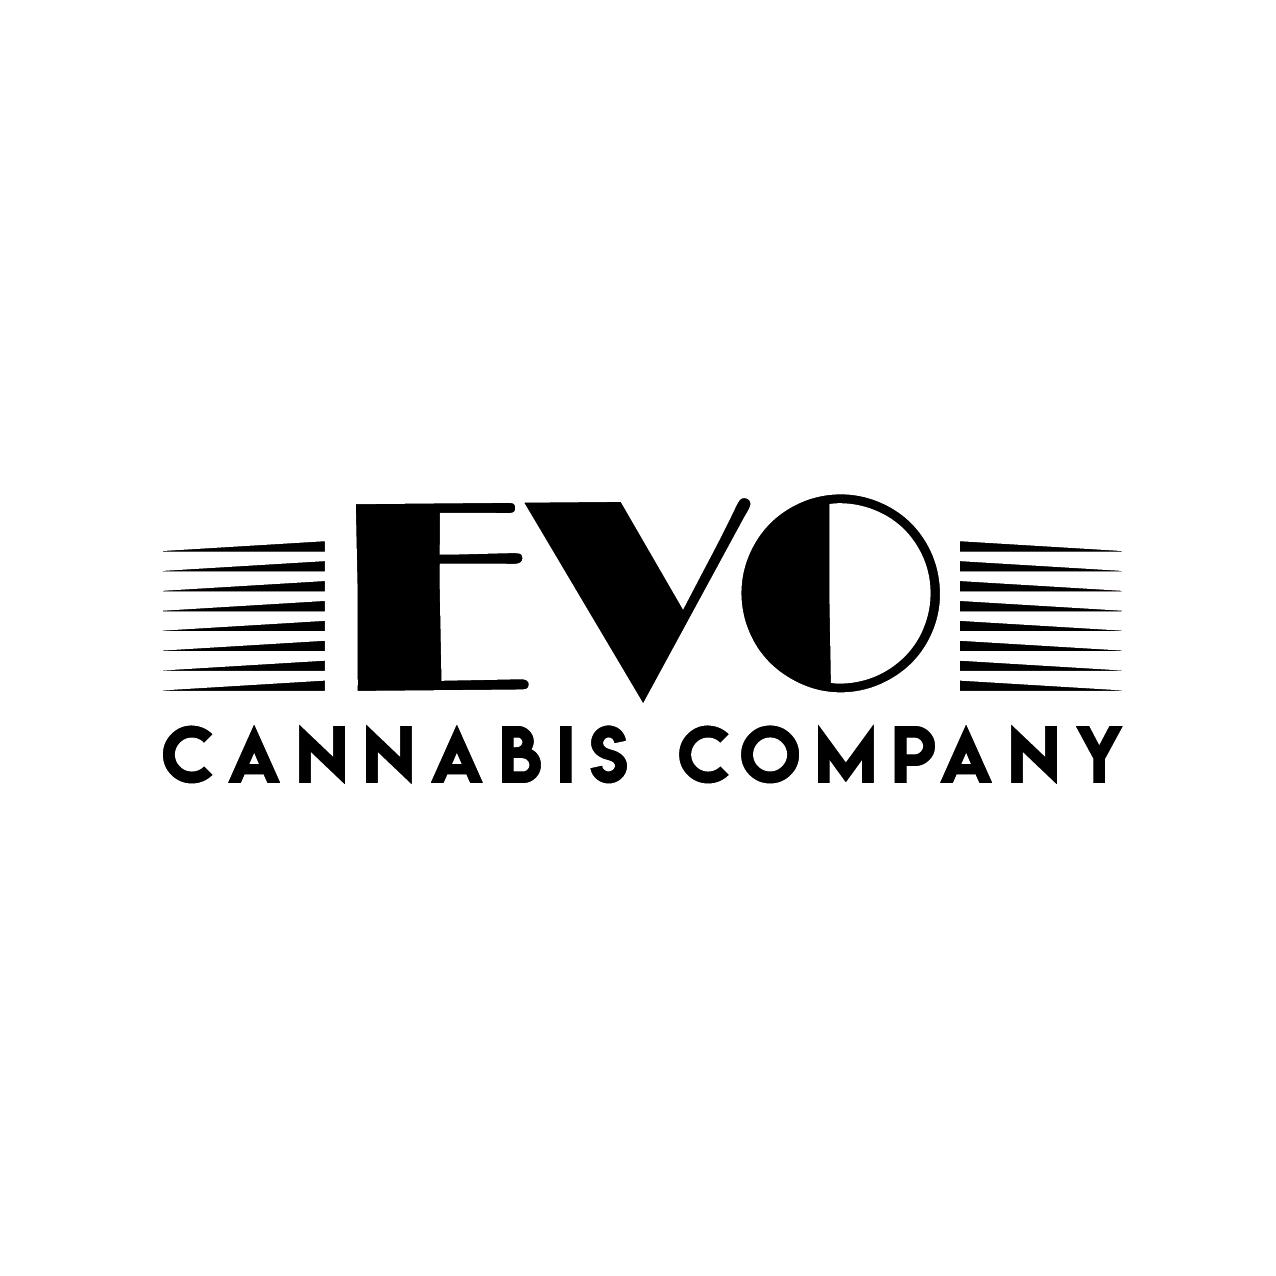 Evolution Cannabis MUW logo